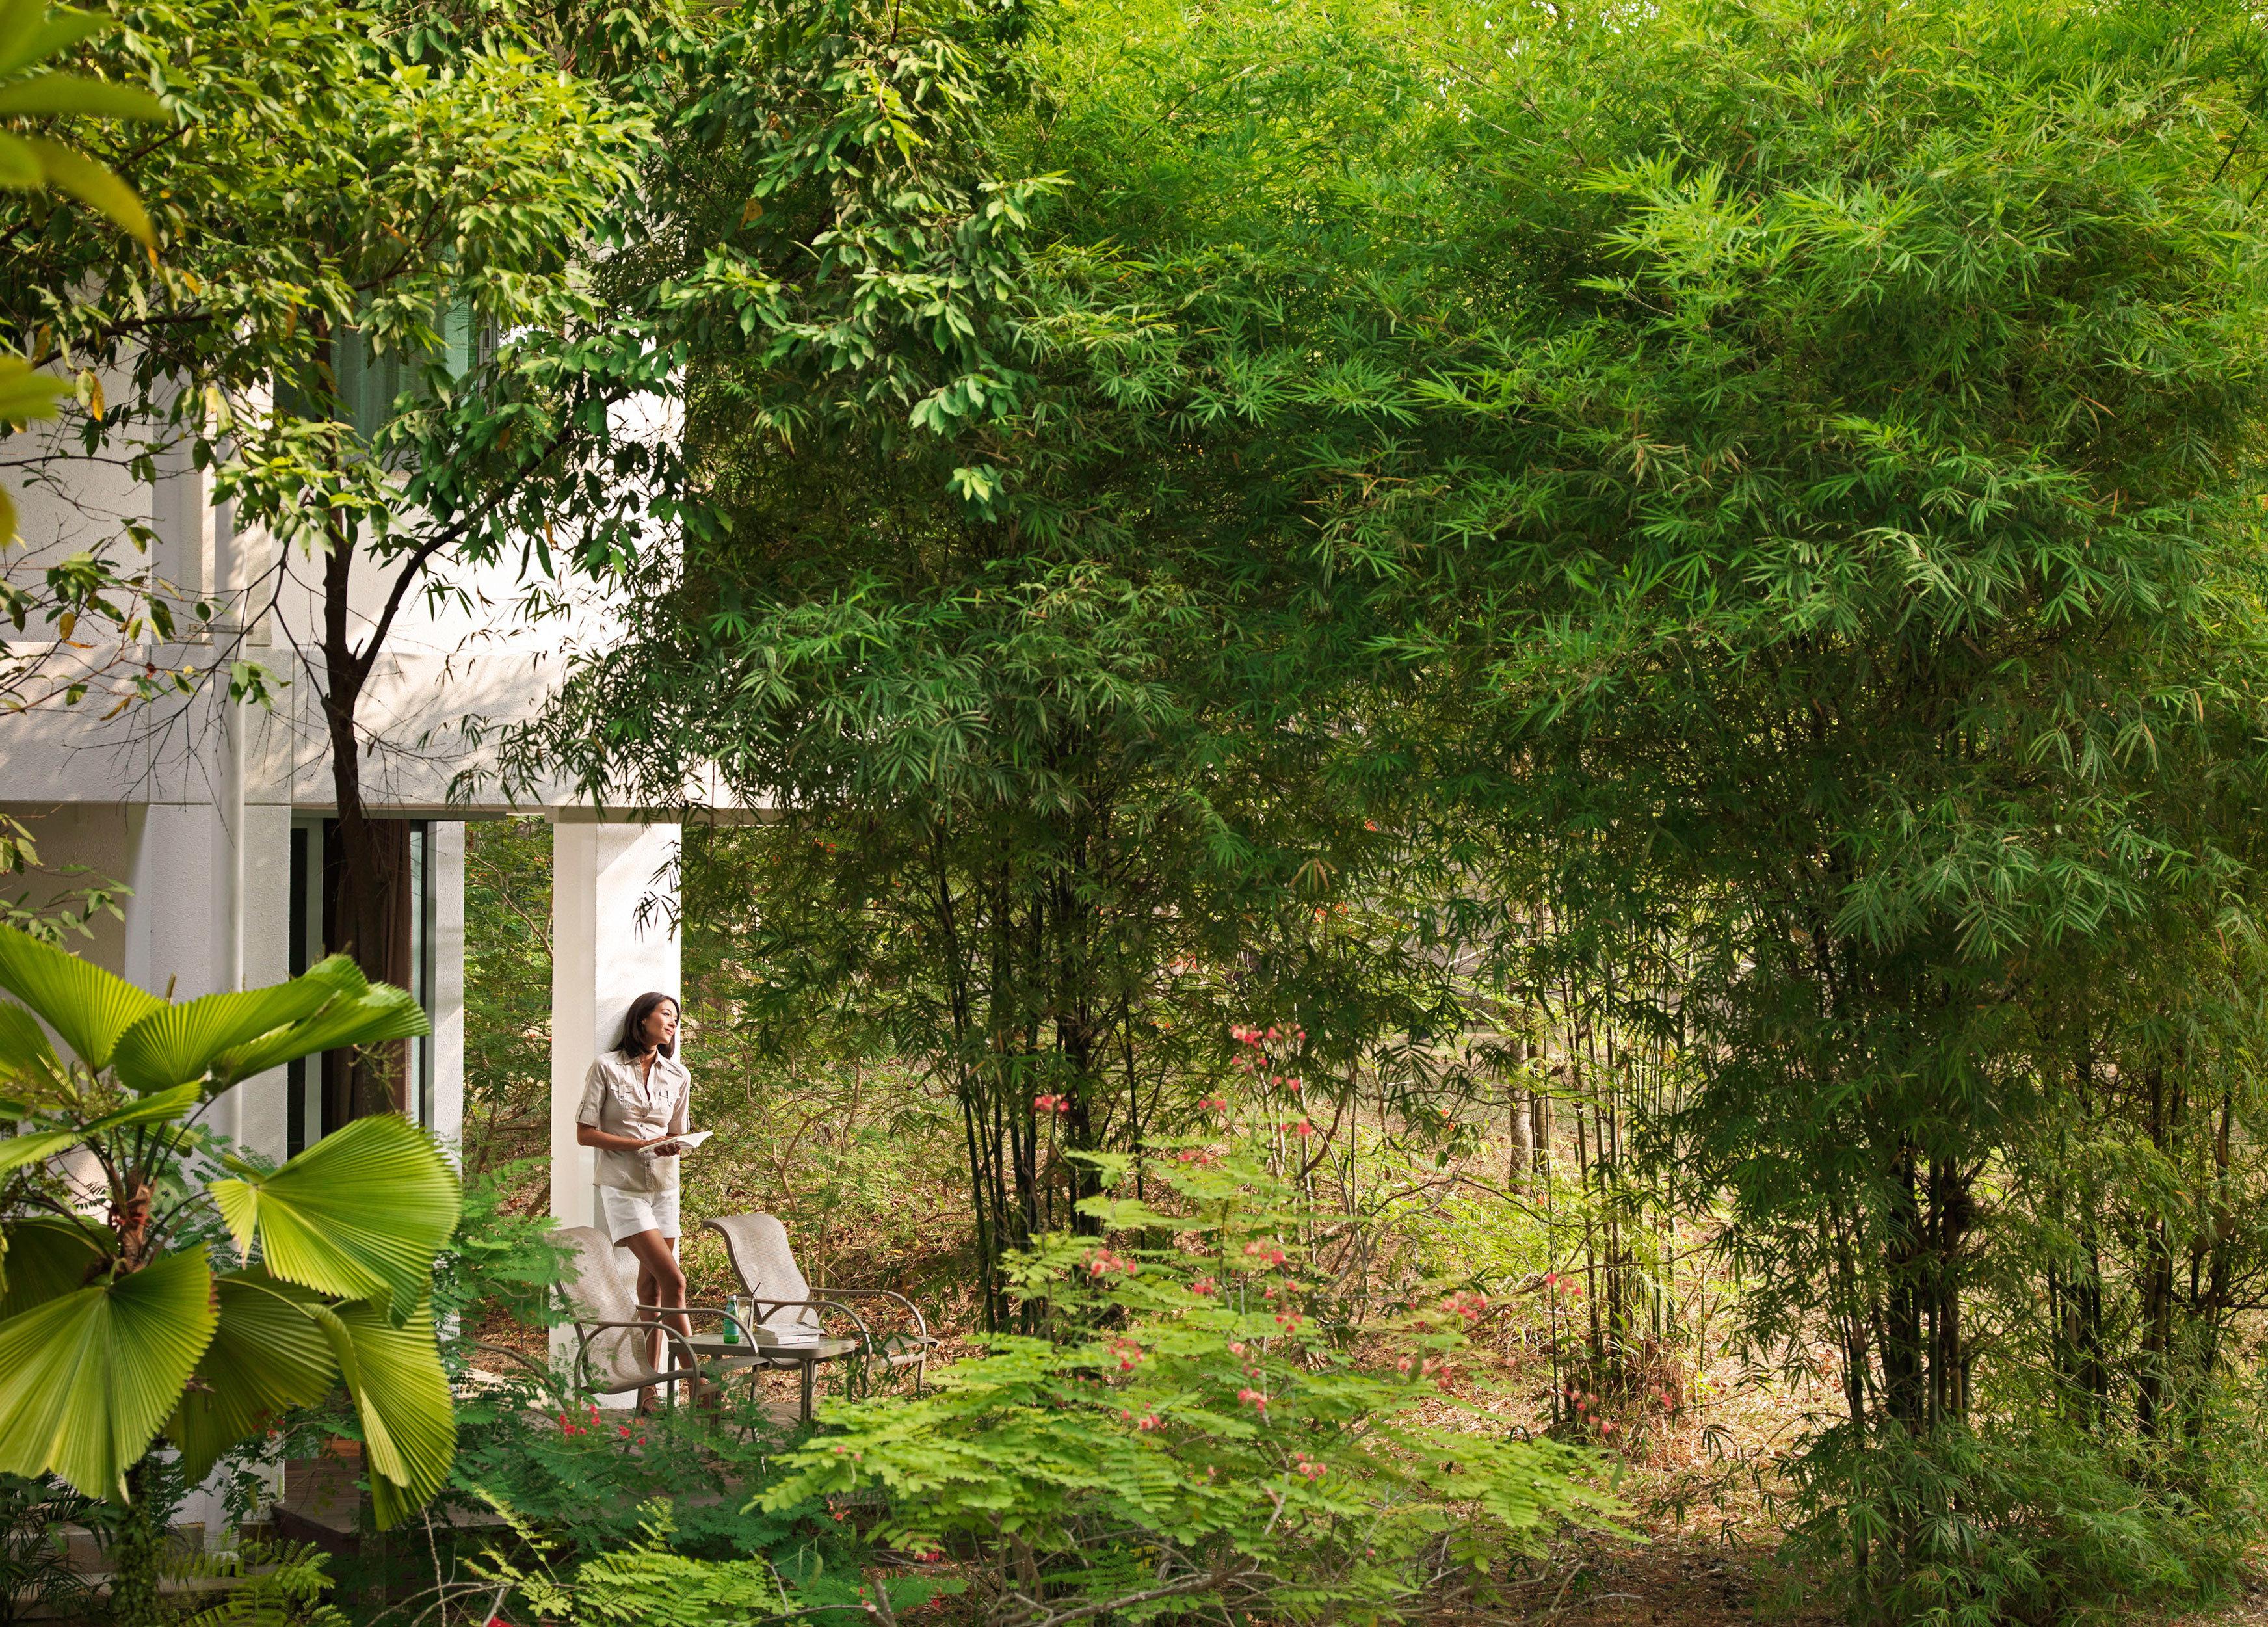 Forest Golf Island Jungle Outdoors Patio Scenic views Spa tree grass green flora plant botany flower Garden woodland woody plant leaf yard rural area backyard plantation shrub rainforest lush